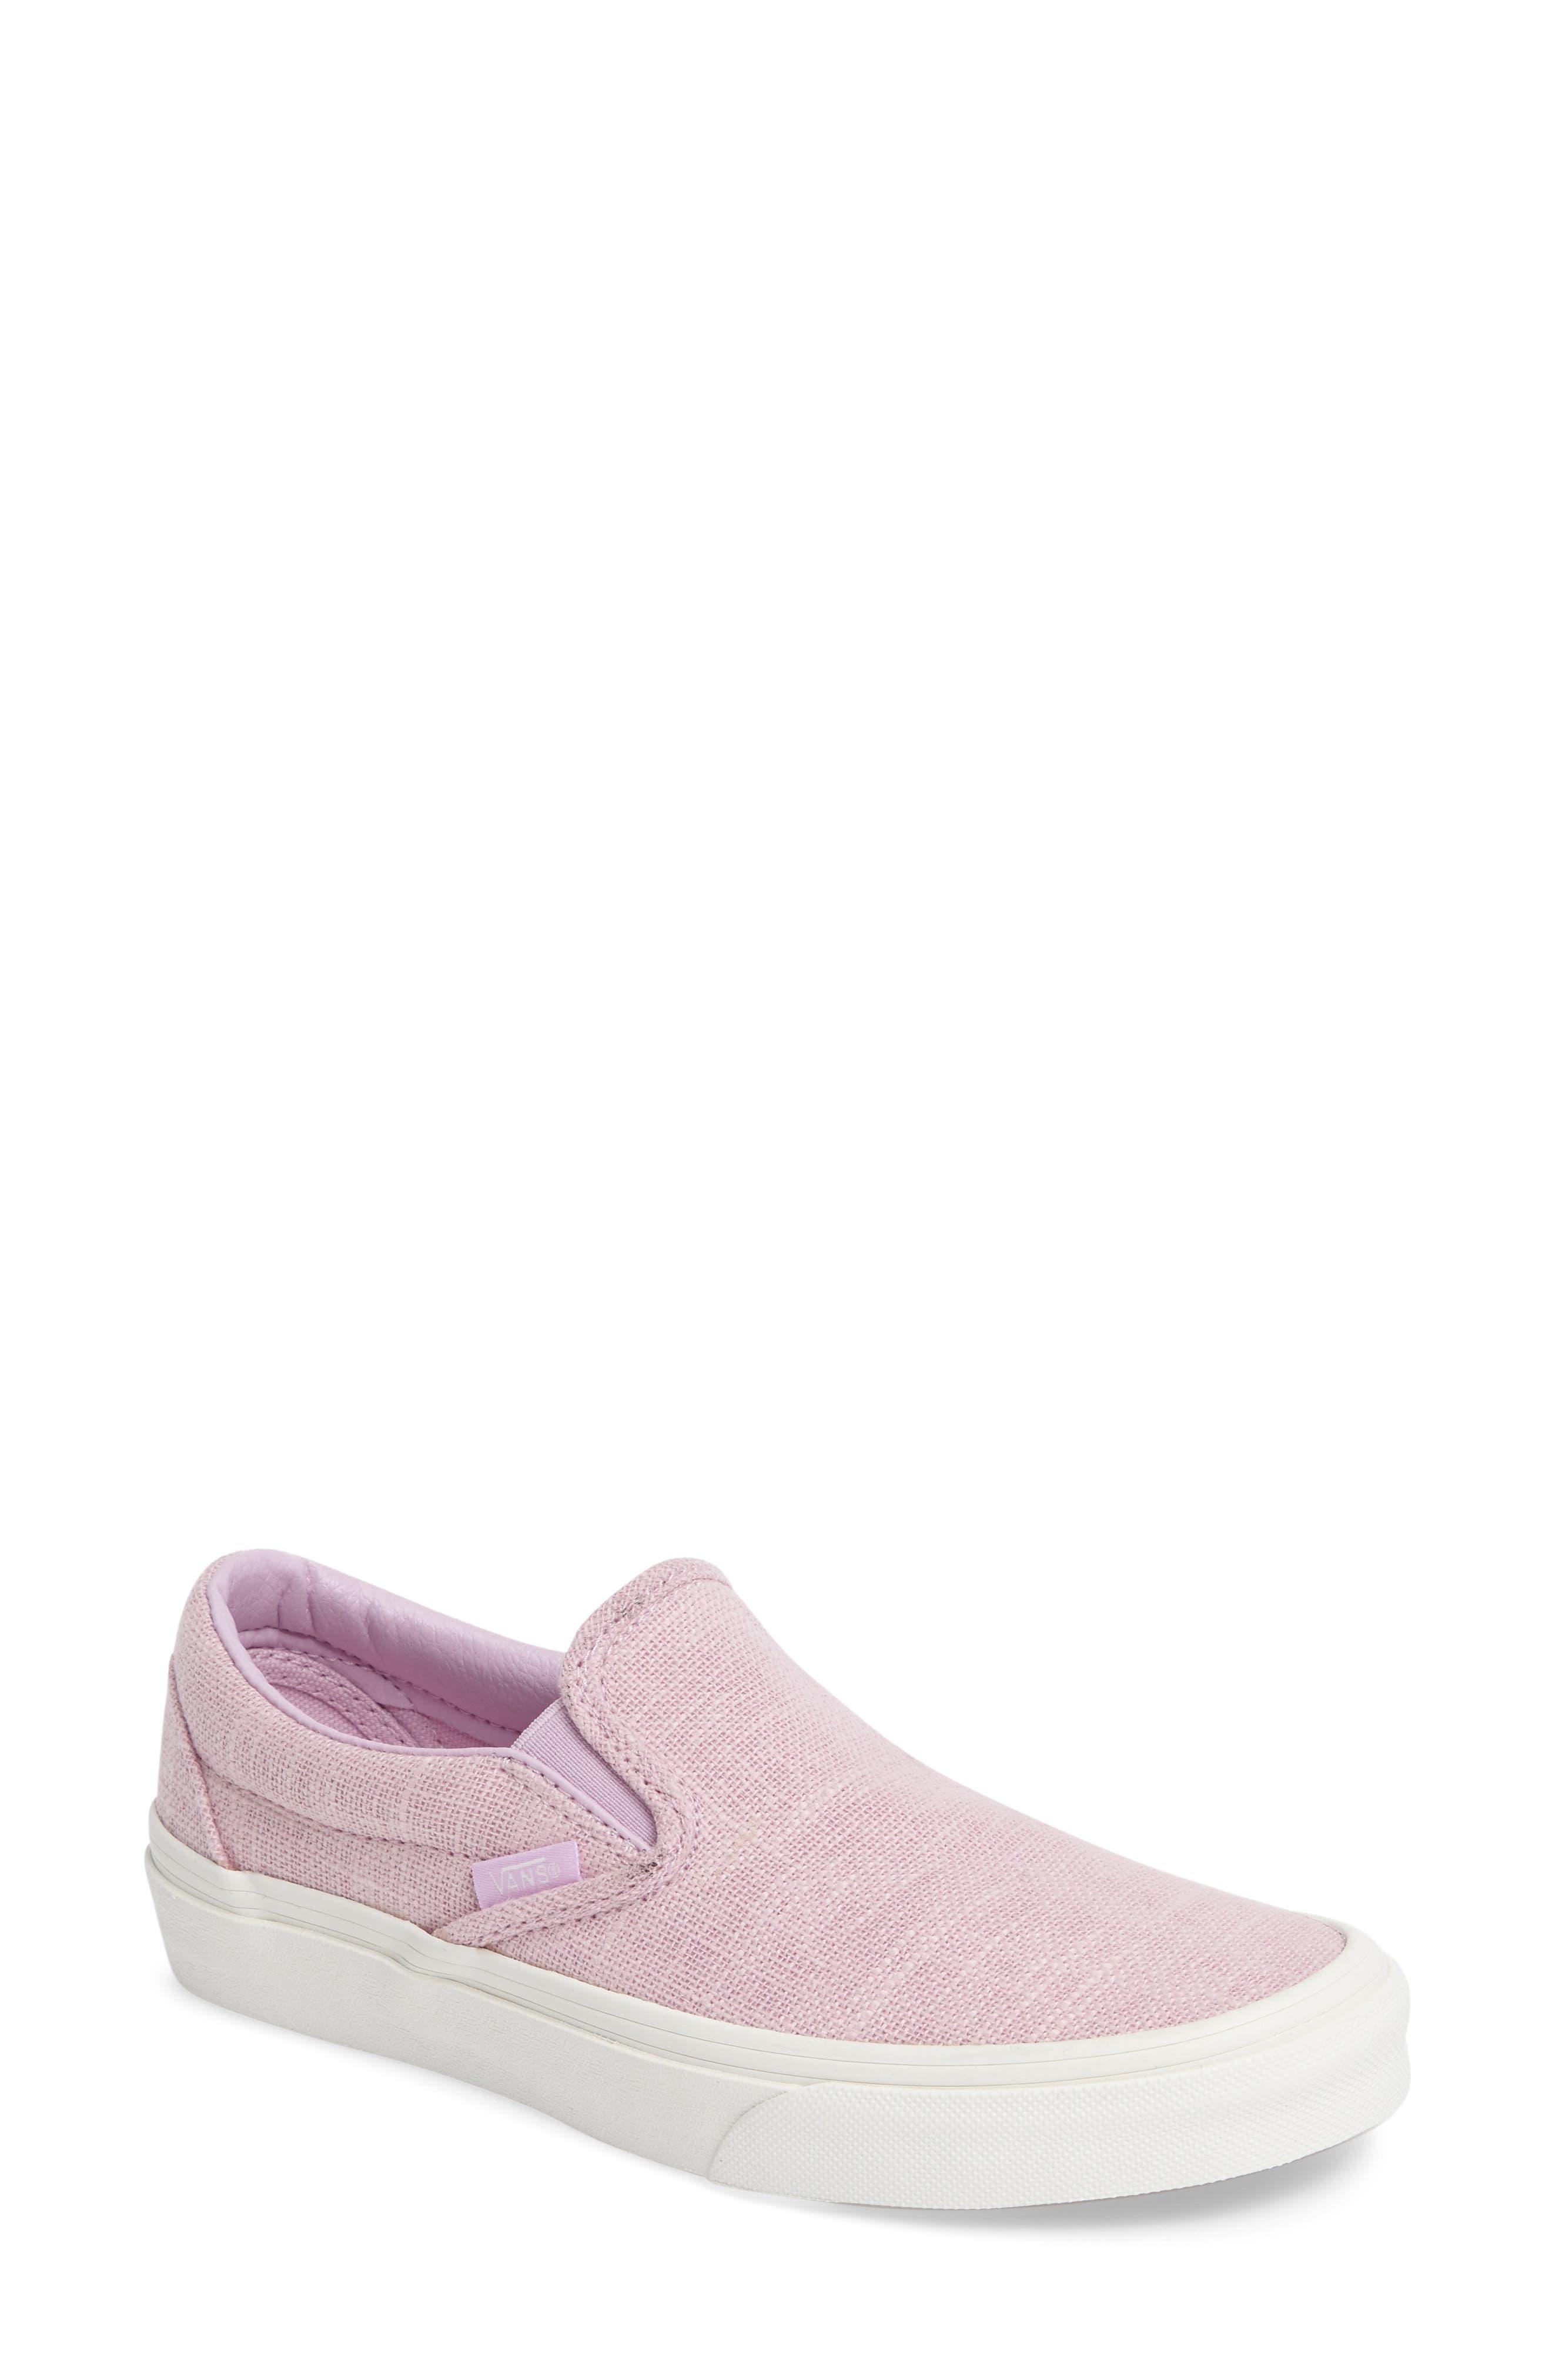 ,                             Classic Slip-On Sneaker,                             Main thumbnail 382, color,                             650